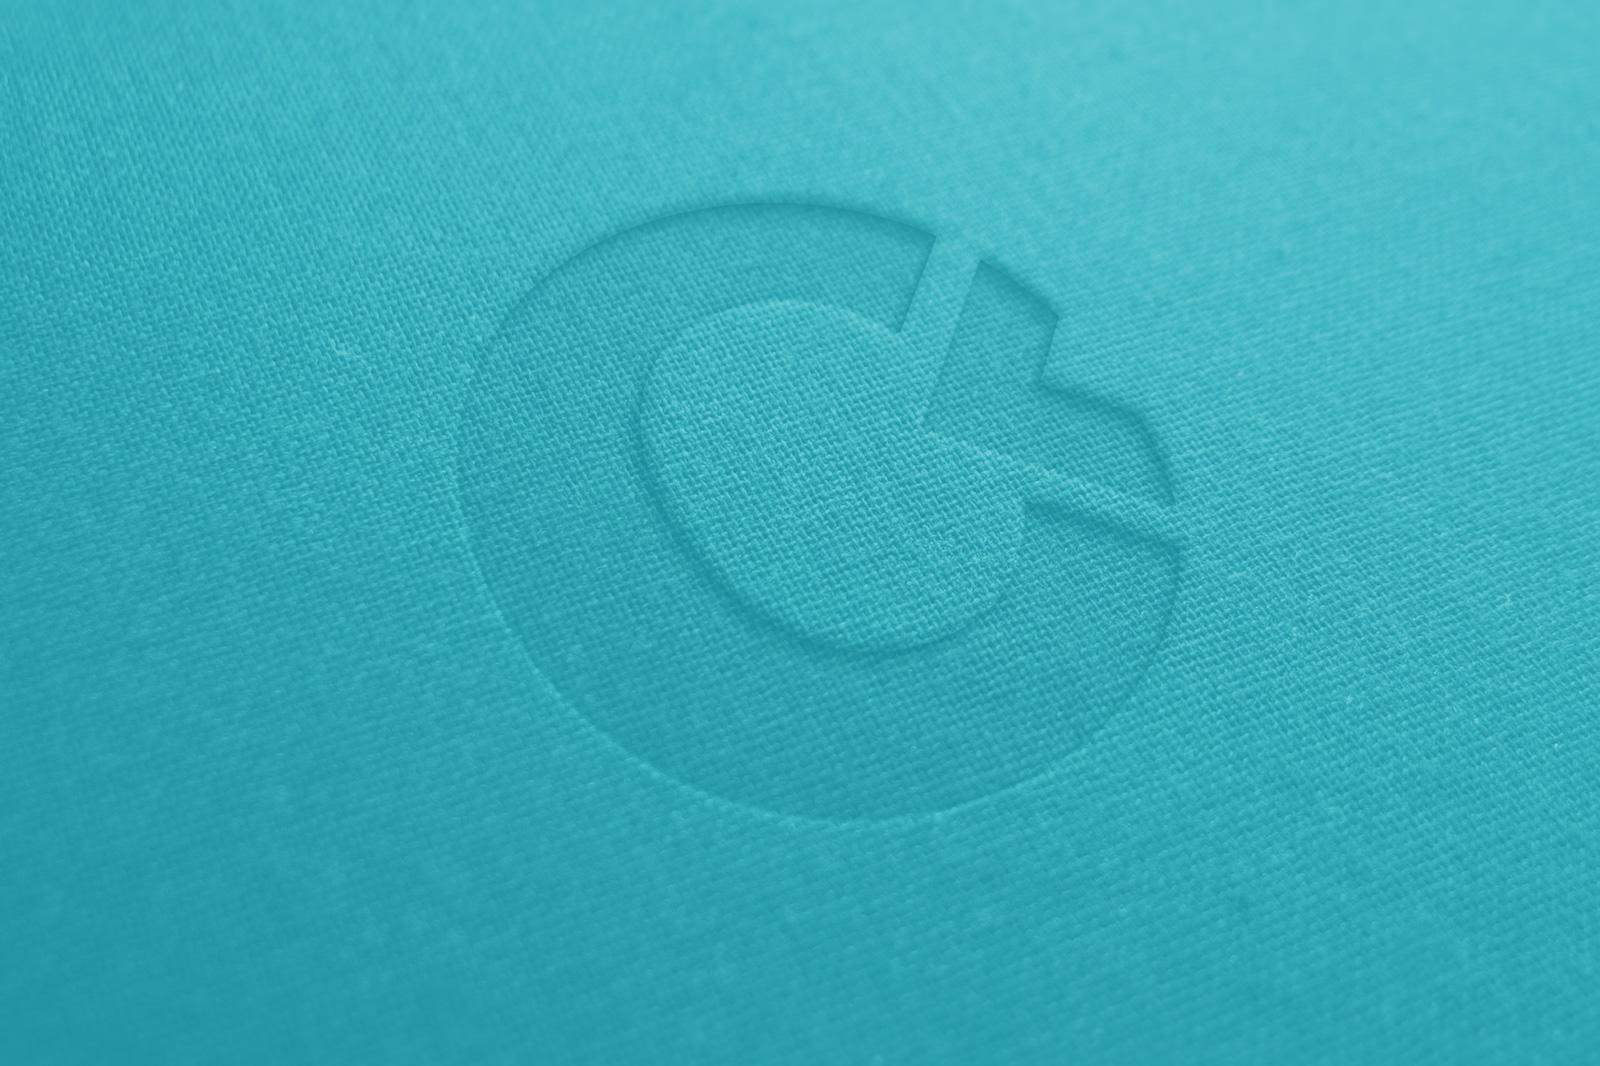 chandlers_logo_embossed_lbob_2000x1333